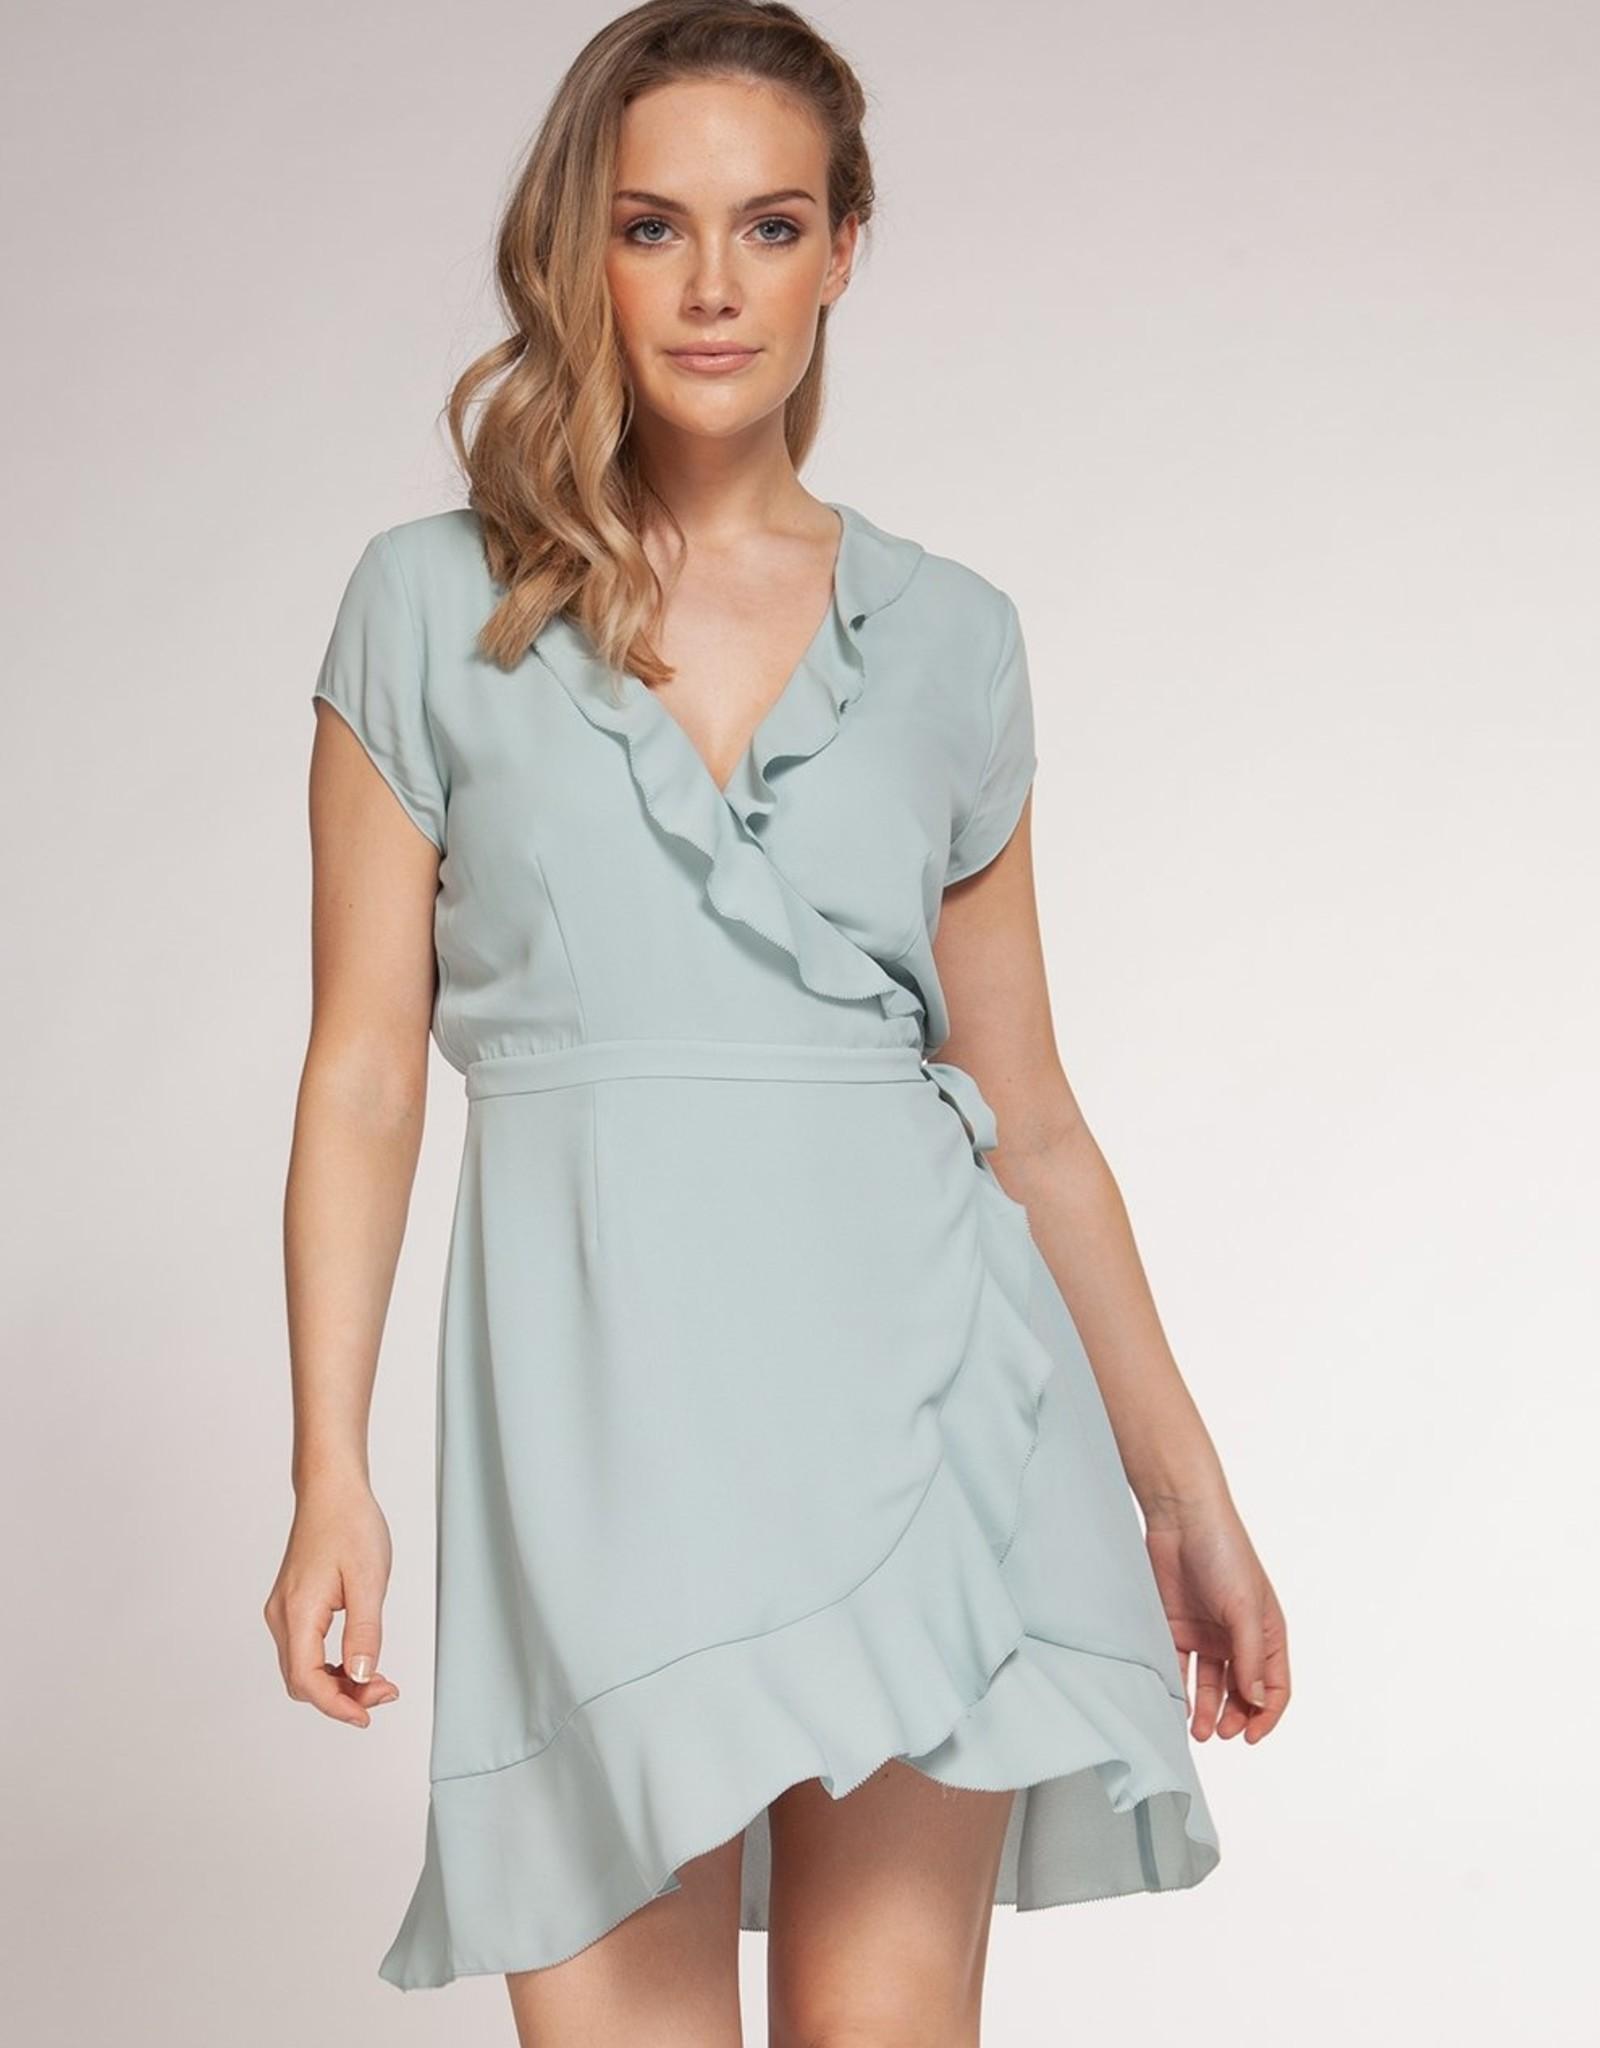 Dex Bros Clothing Co Ltd. Ruffle Wrap Dress